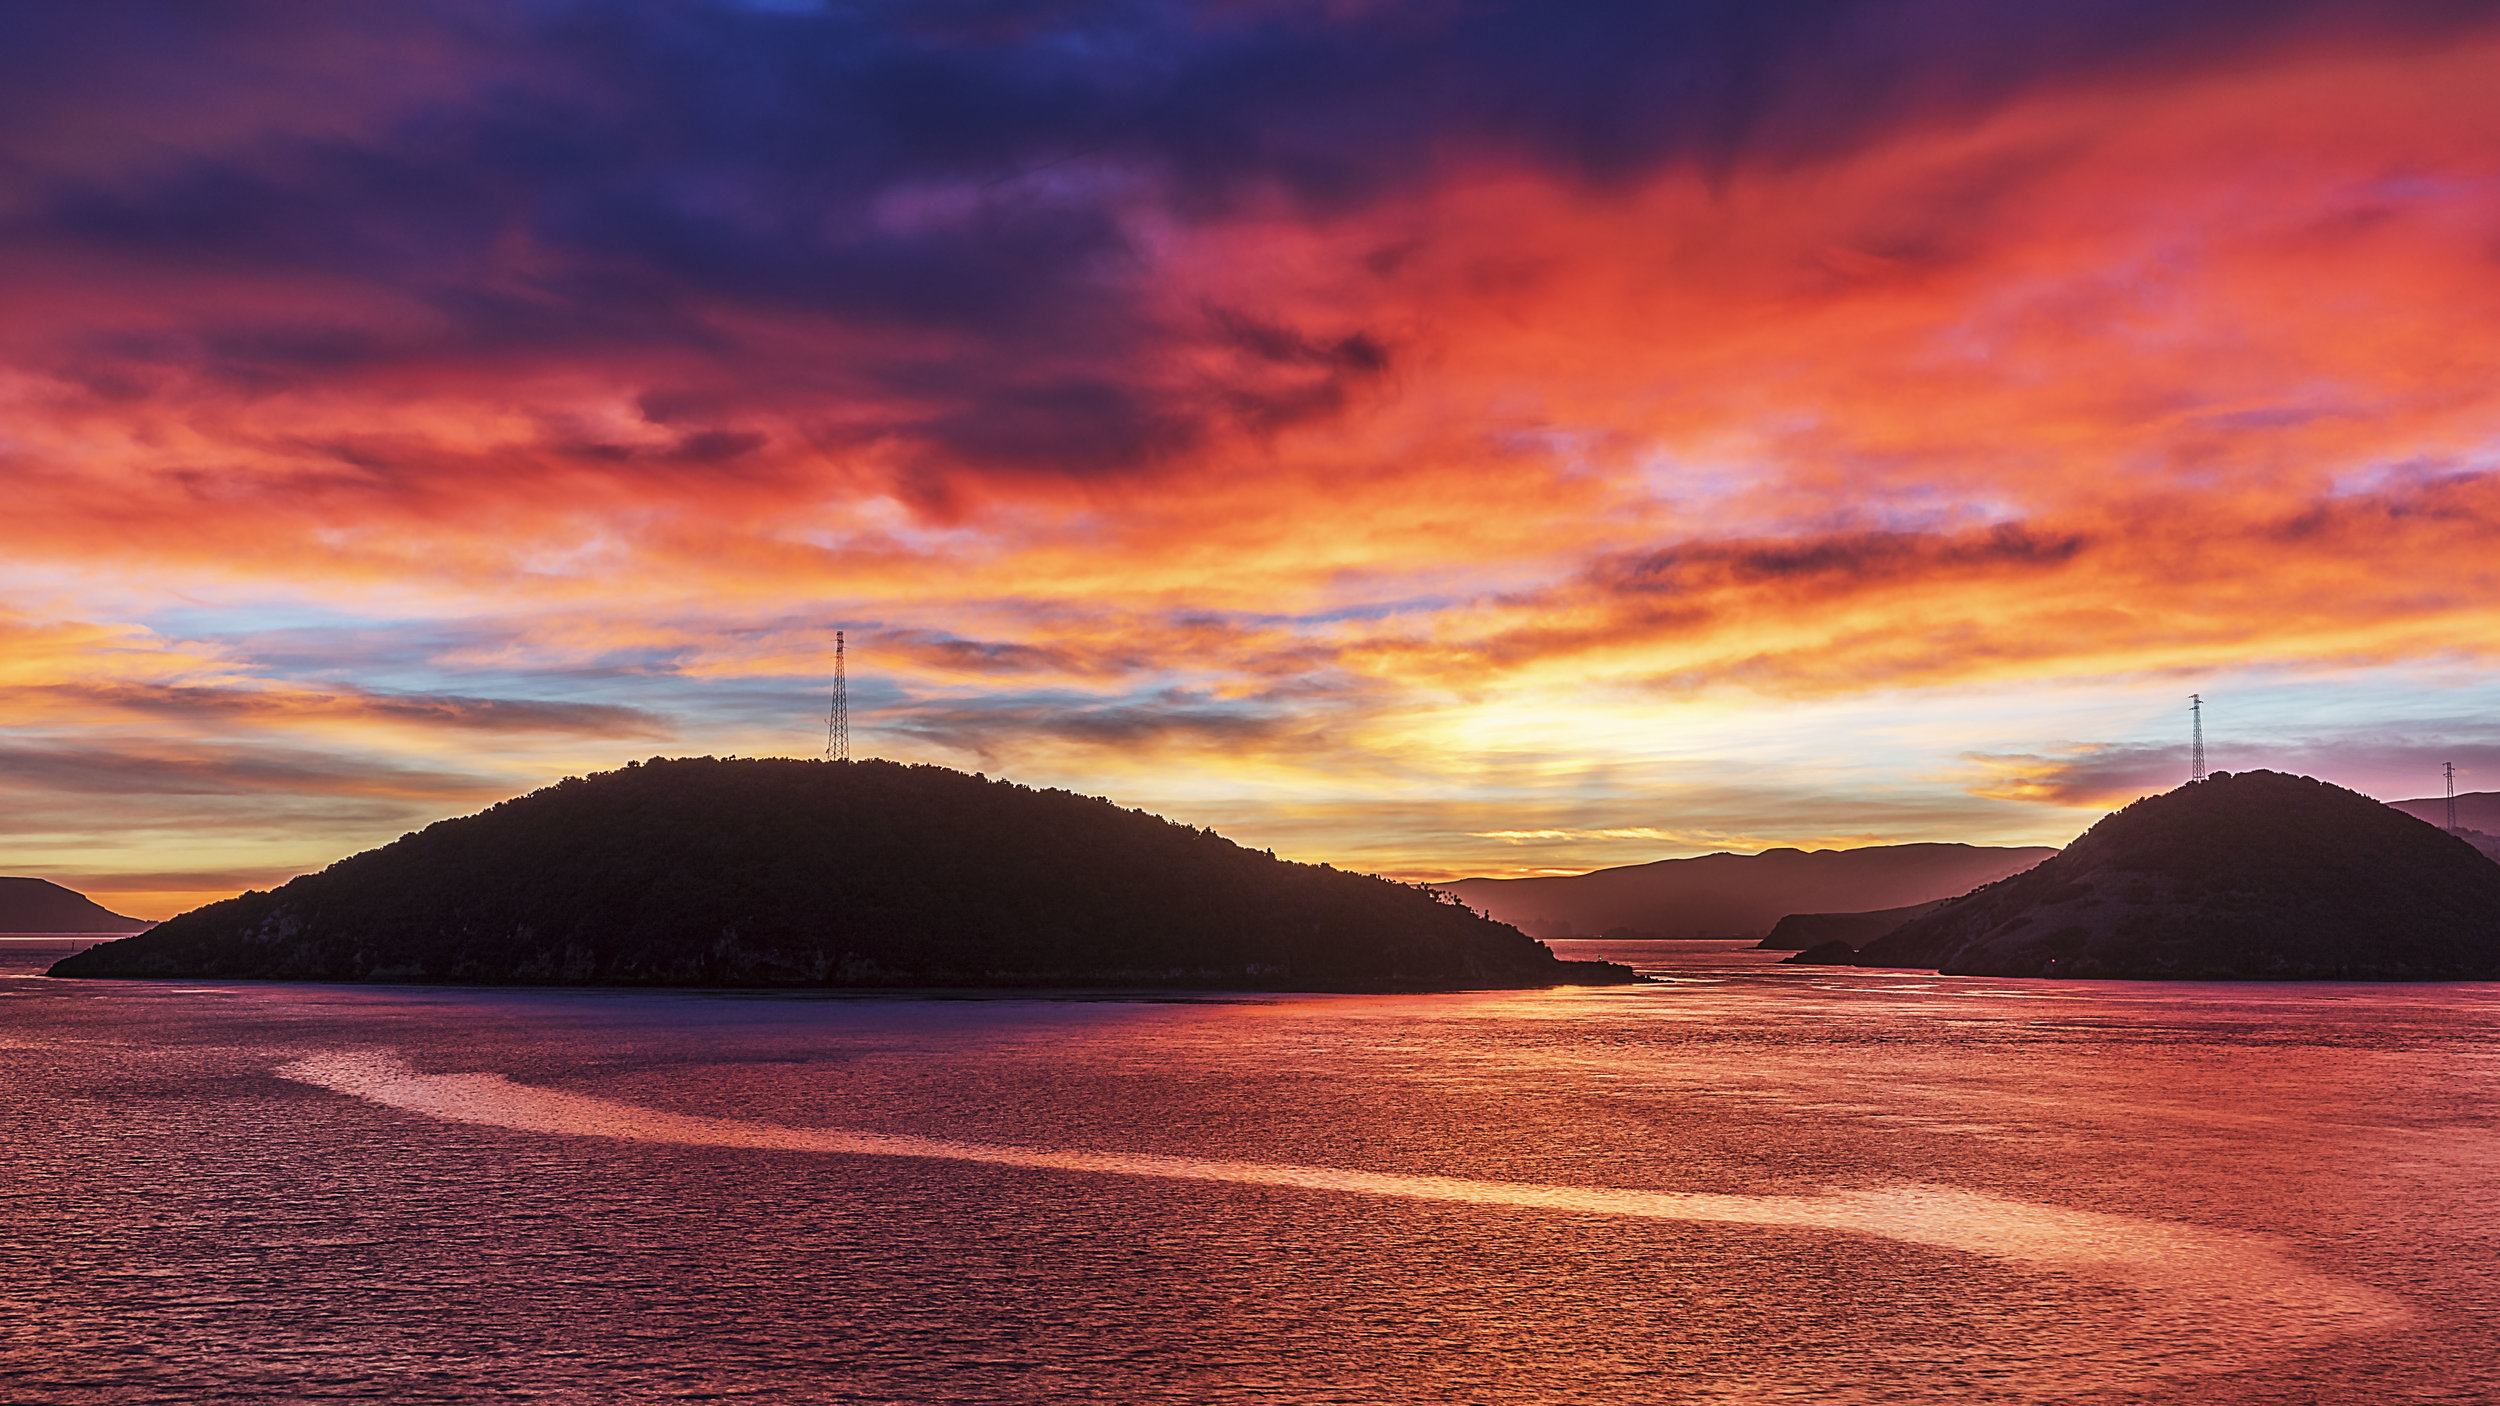 Rakiriri Island Sunrise by Andy Thompson